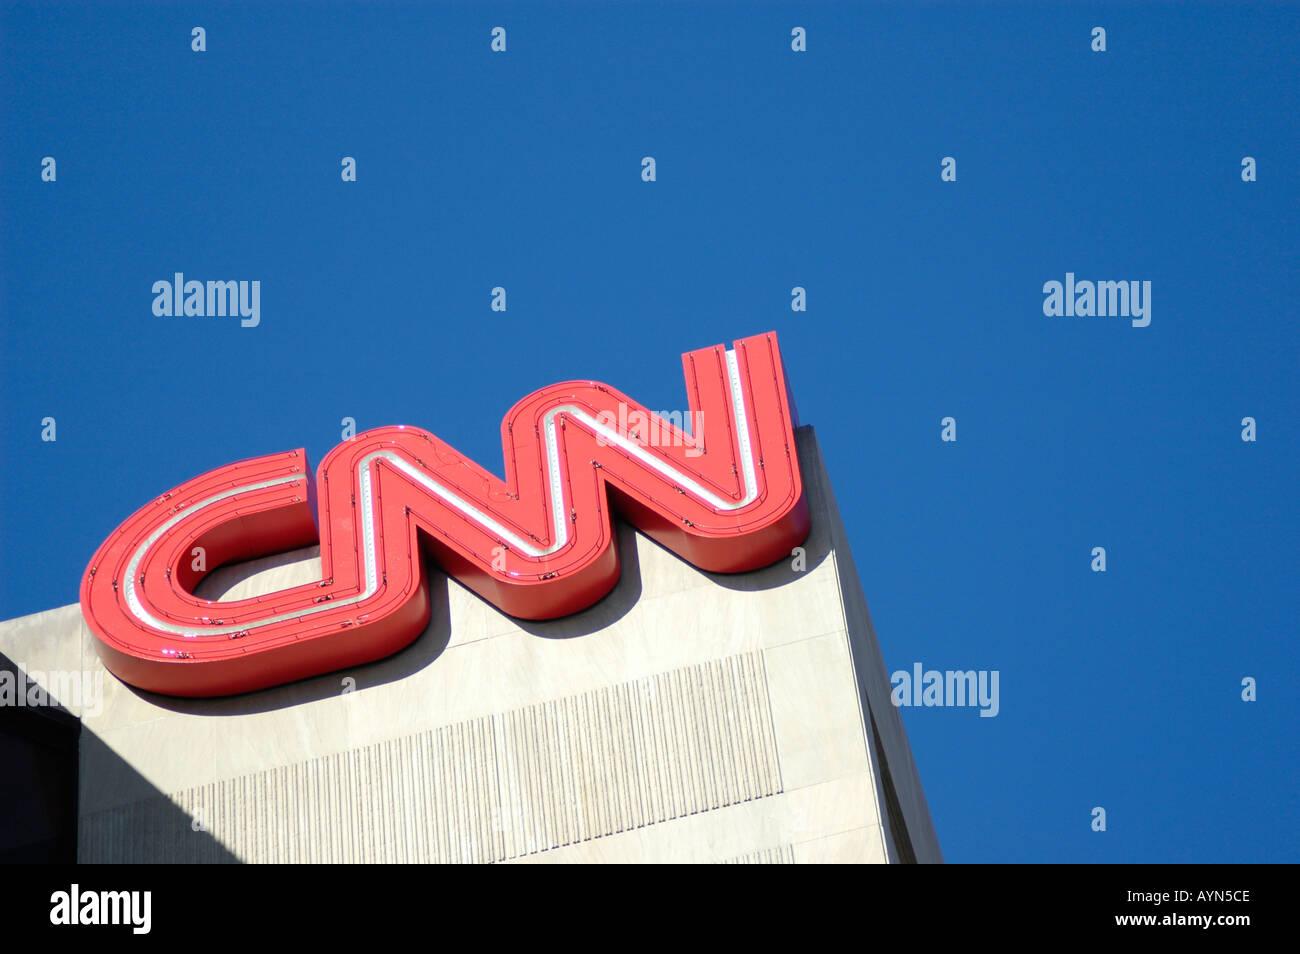 Warning Travel Help Communications Notice Cnn Cabel News Network